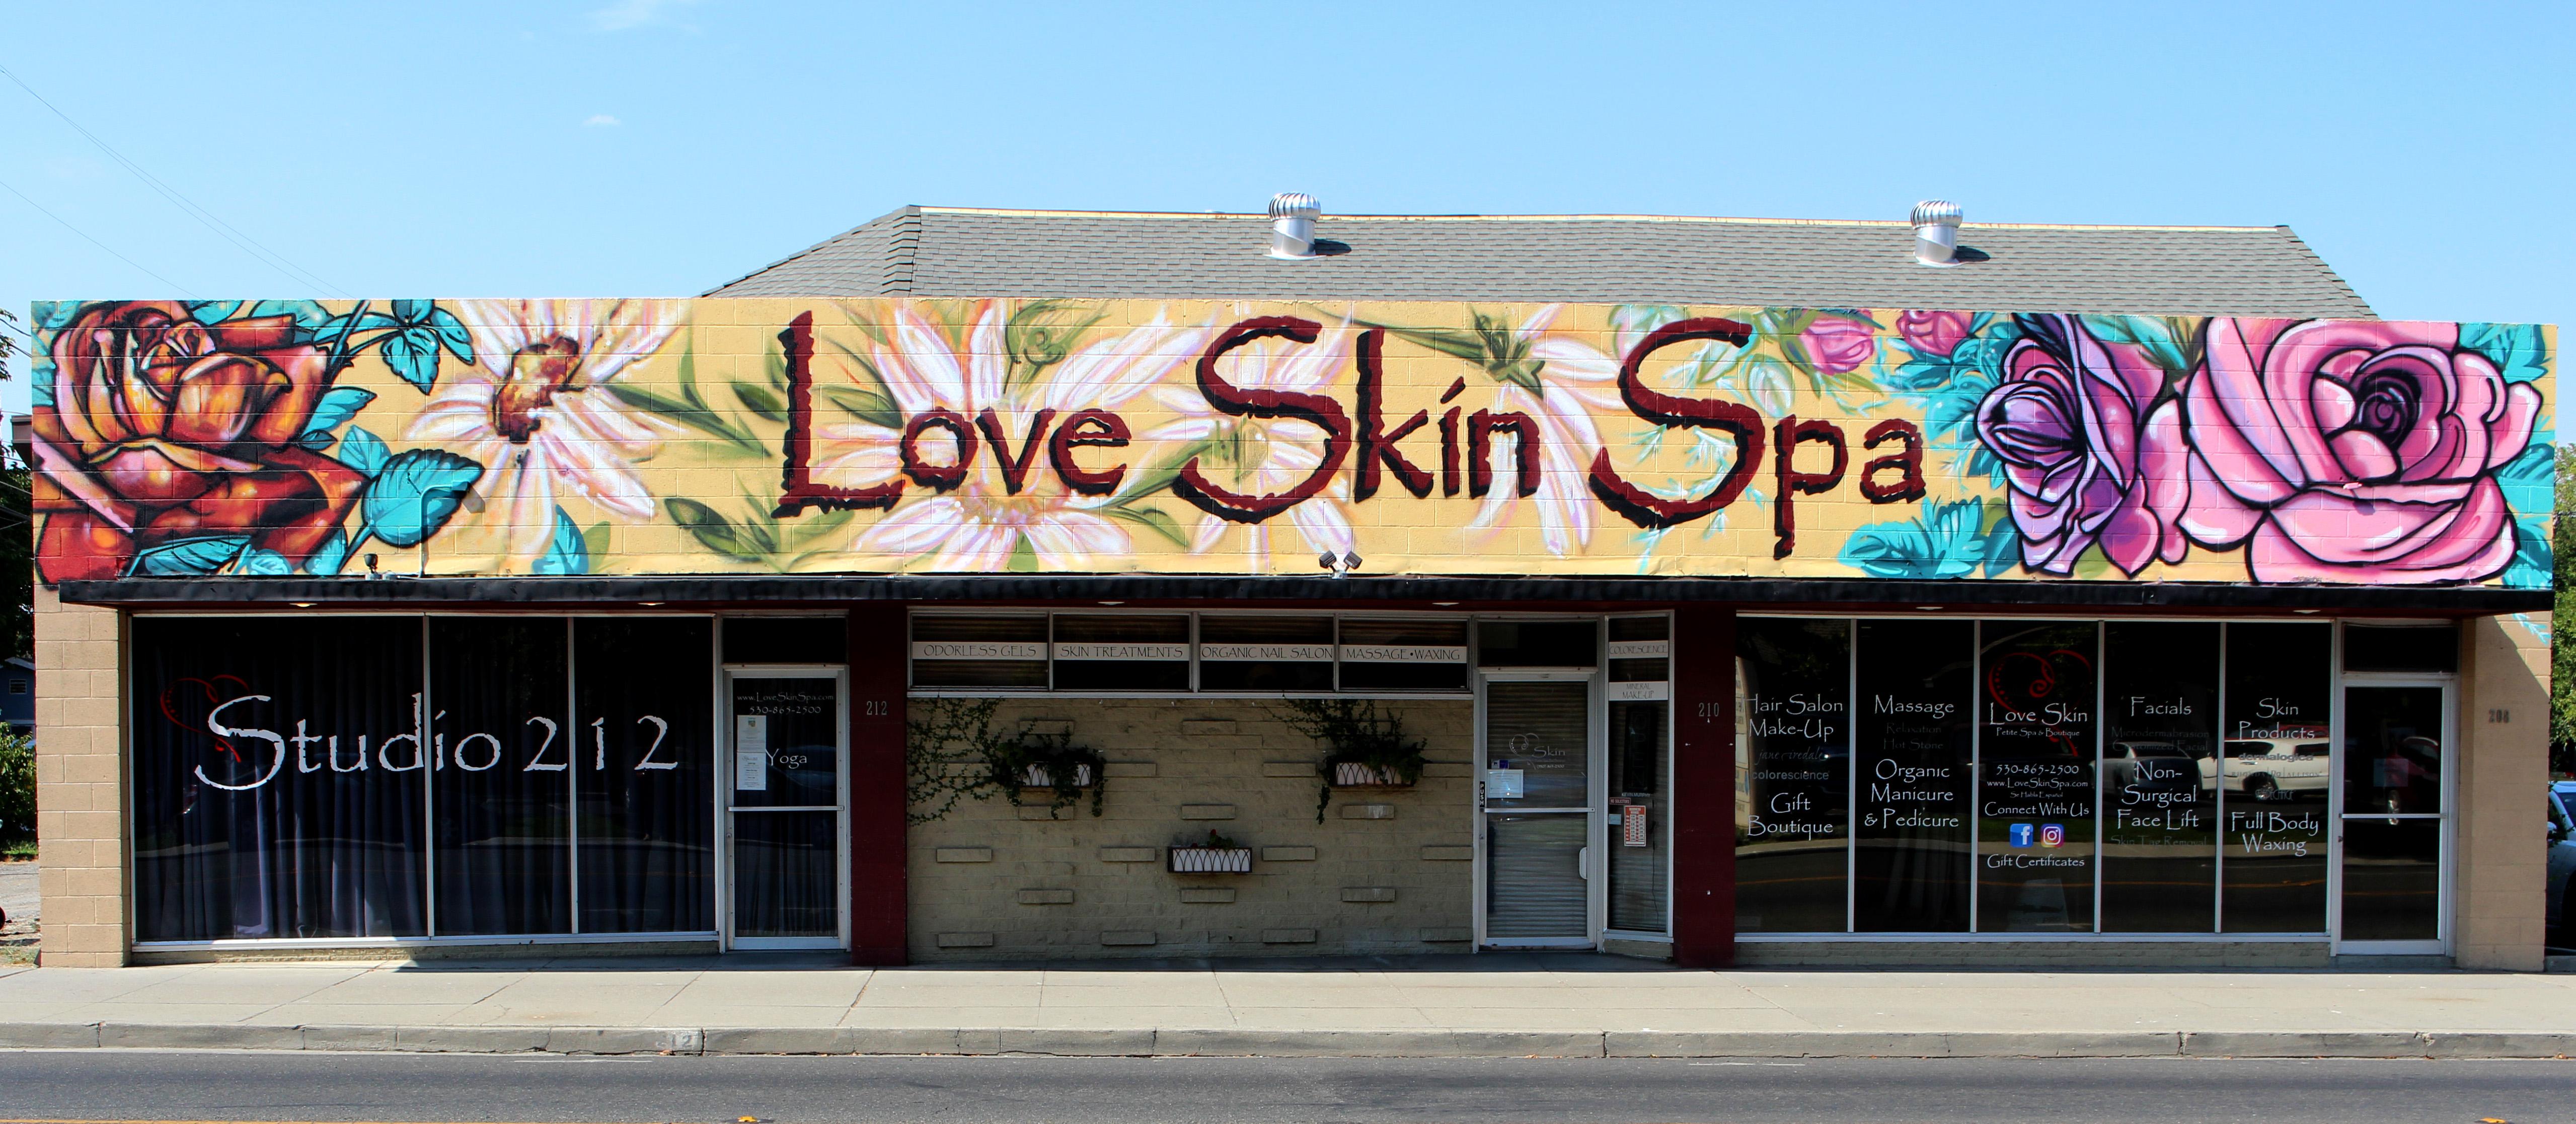 Love Skin Spa